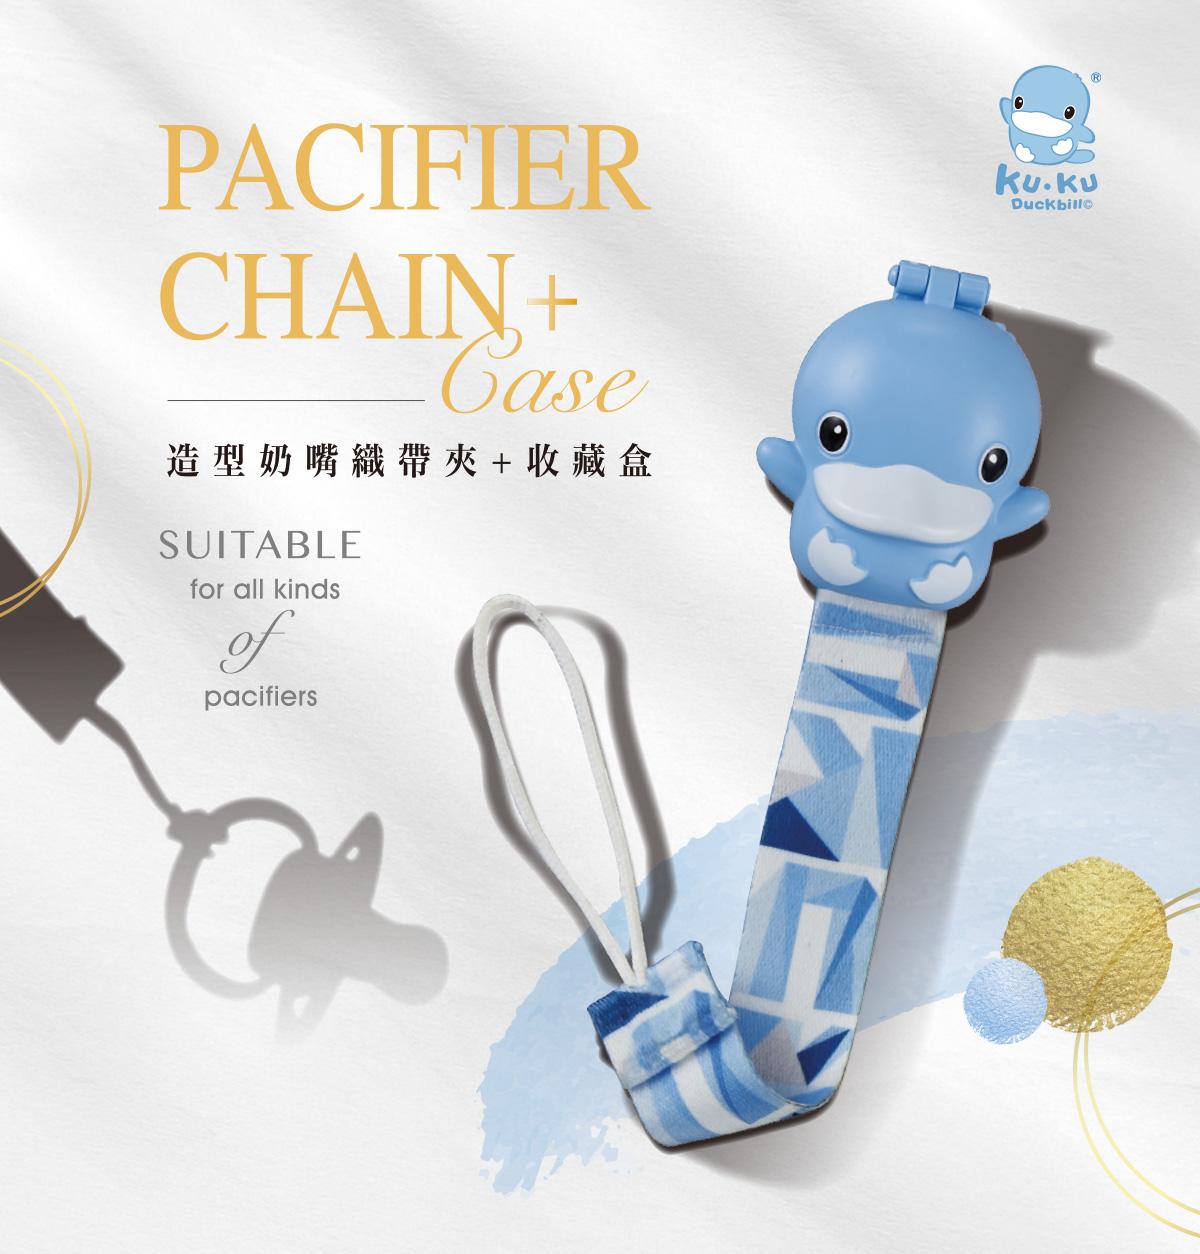 proimages/bottles_accessories/Pacifier_holder/5493/5493-奶嘴織帶收藏盒EDM-1.jpg